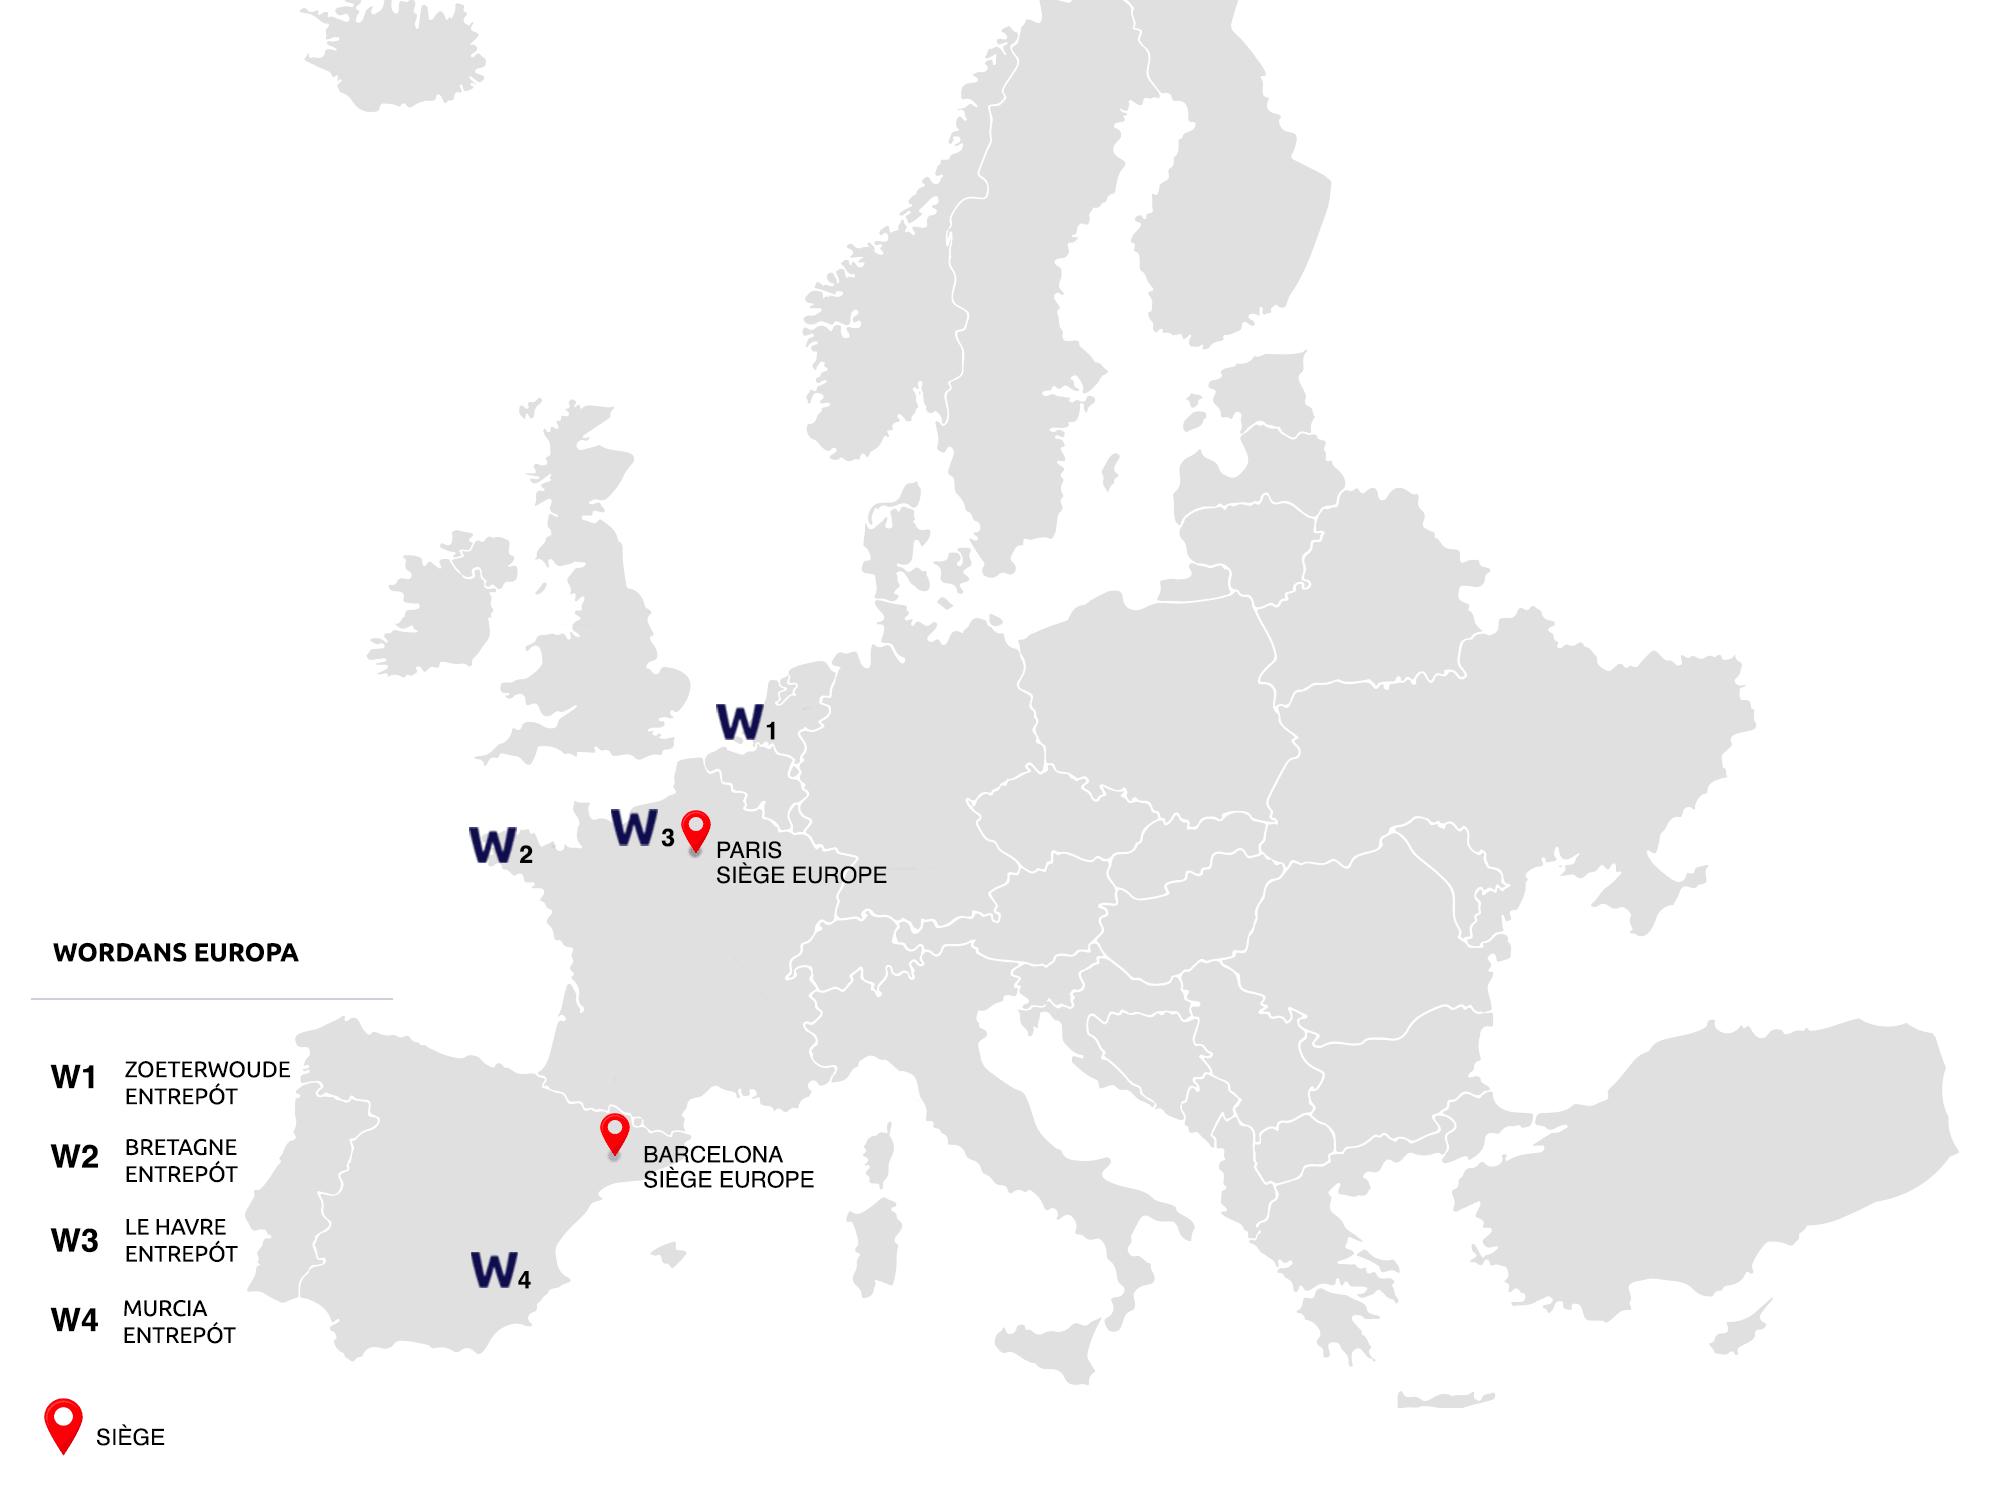 Carte des entrepôts